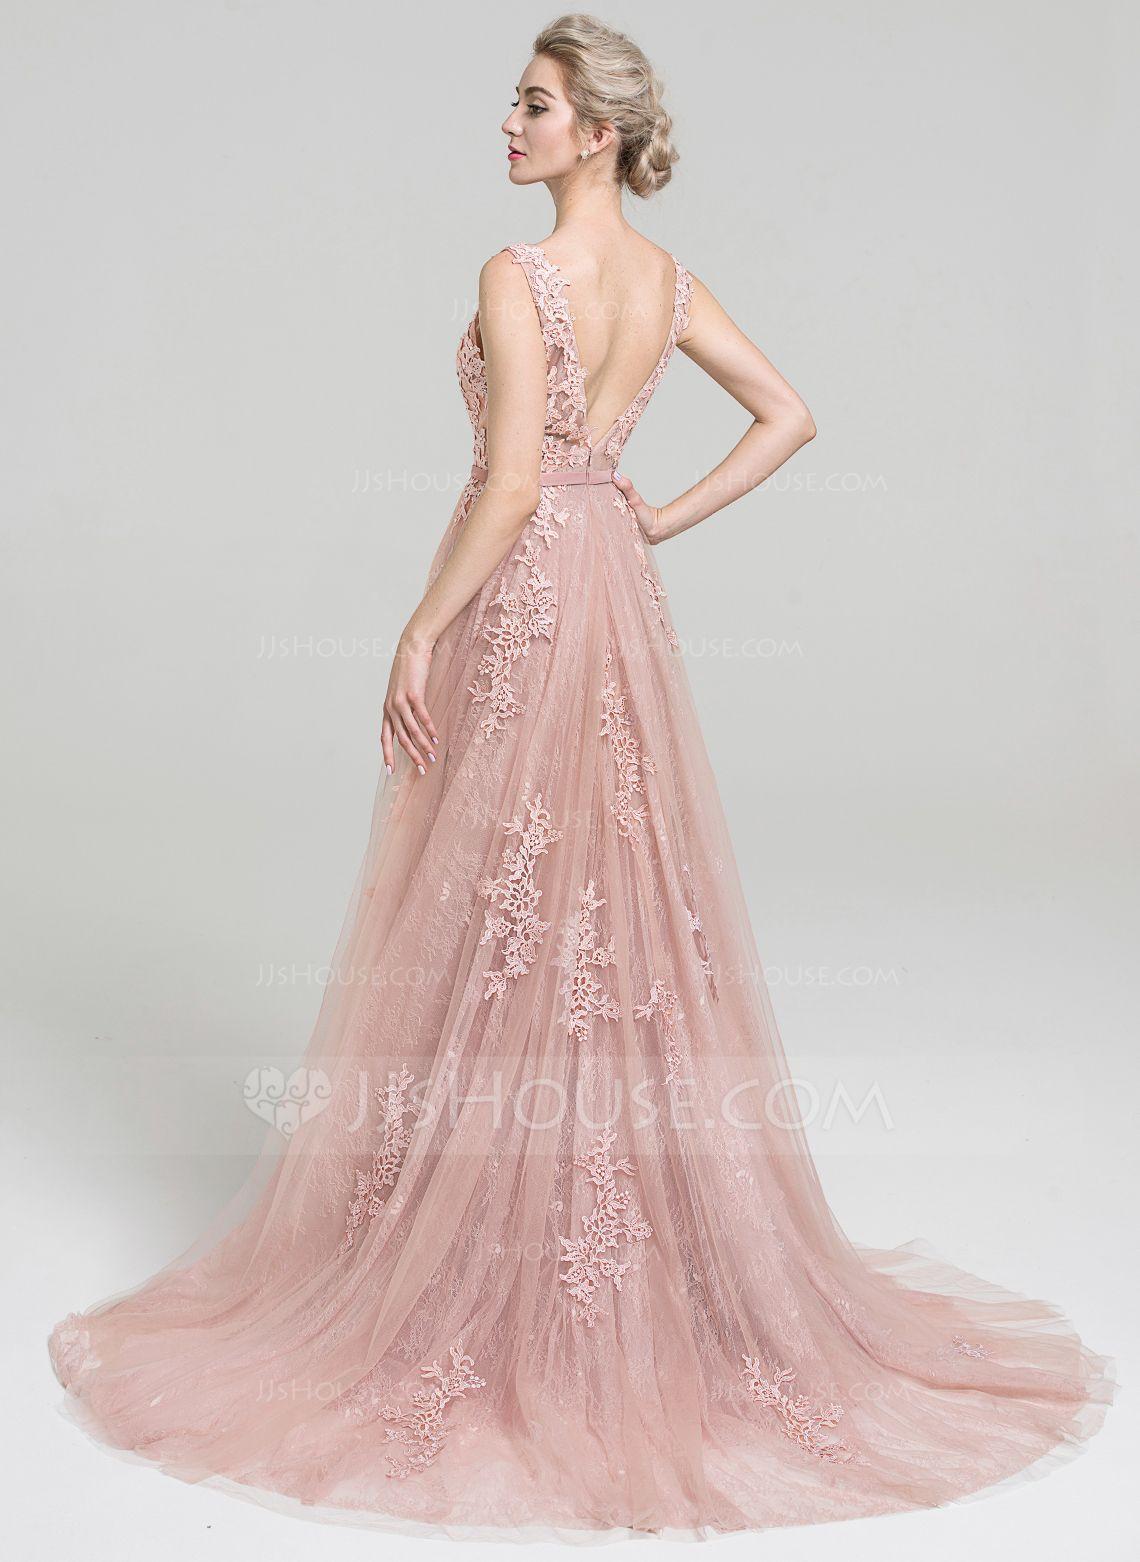 Lujoso Bellos Vestidos De Novia En Línea Modelo - Colección de ...